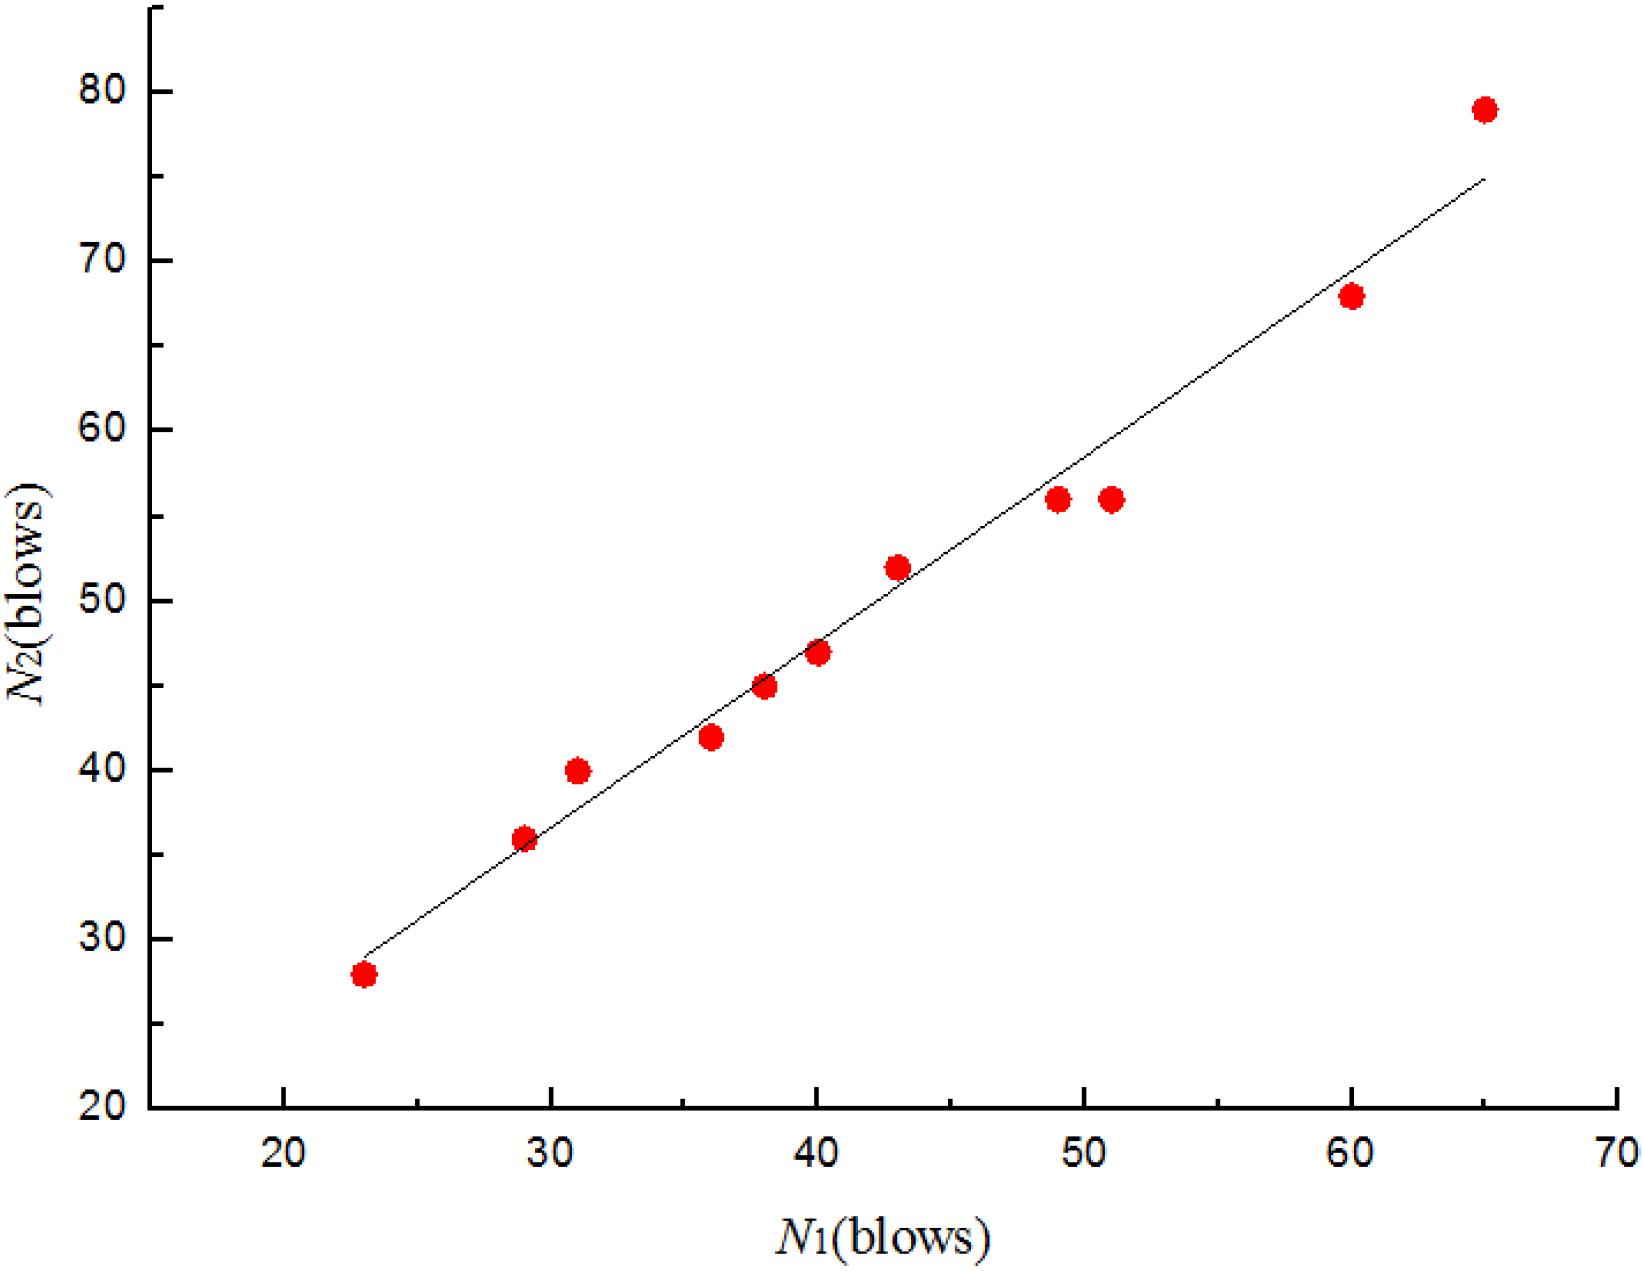 nfl statistics 08 12 regression analysis Statistics forum topics 0  installing on 08/12/17 7:44 am  1  design a temporal classification problem regression statistics, regression analysis.